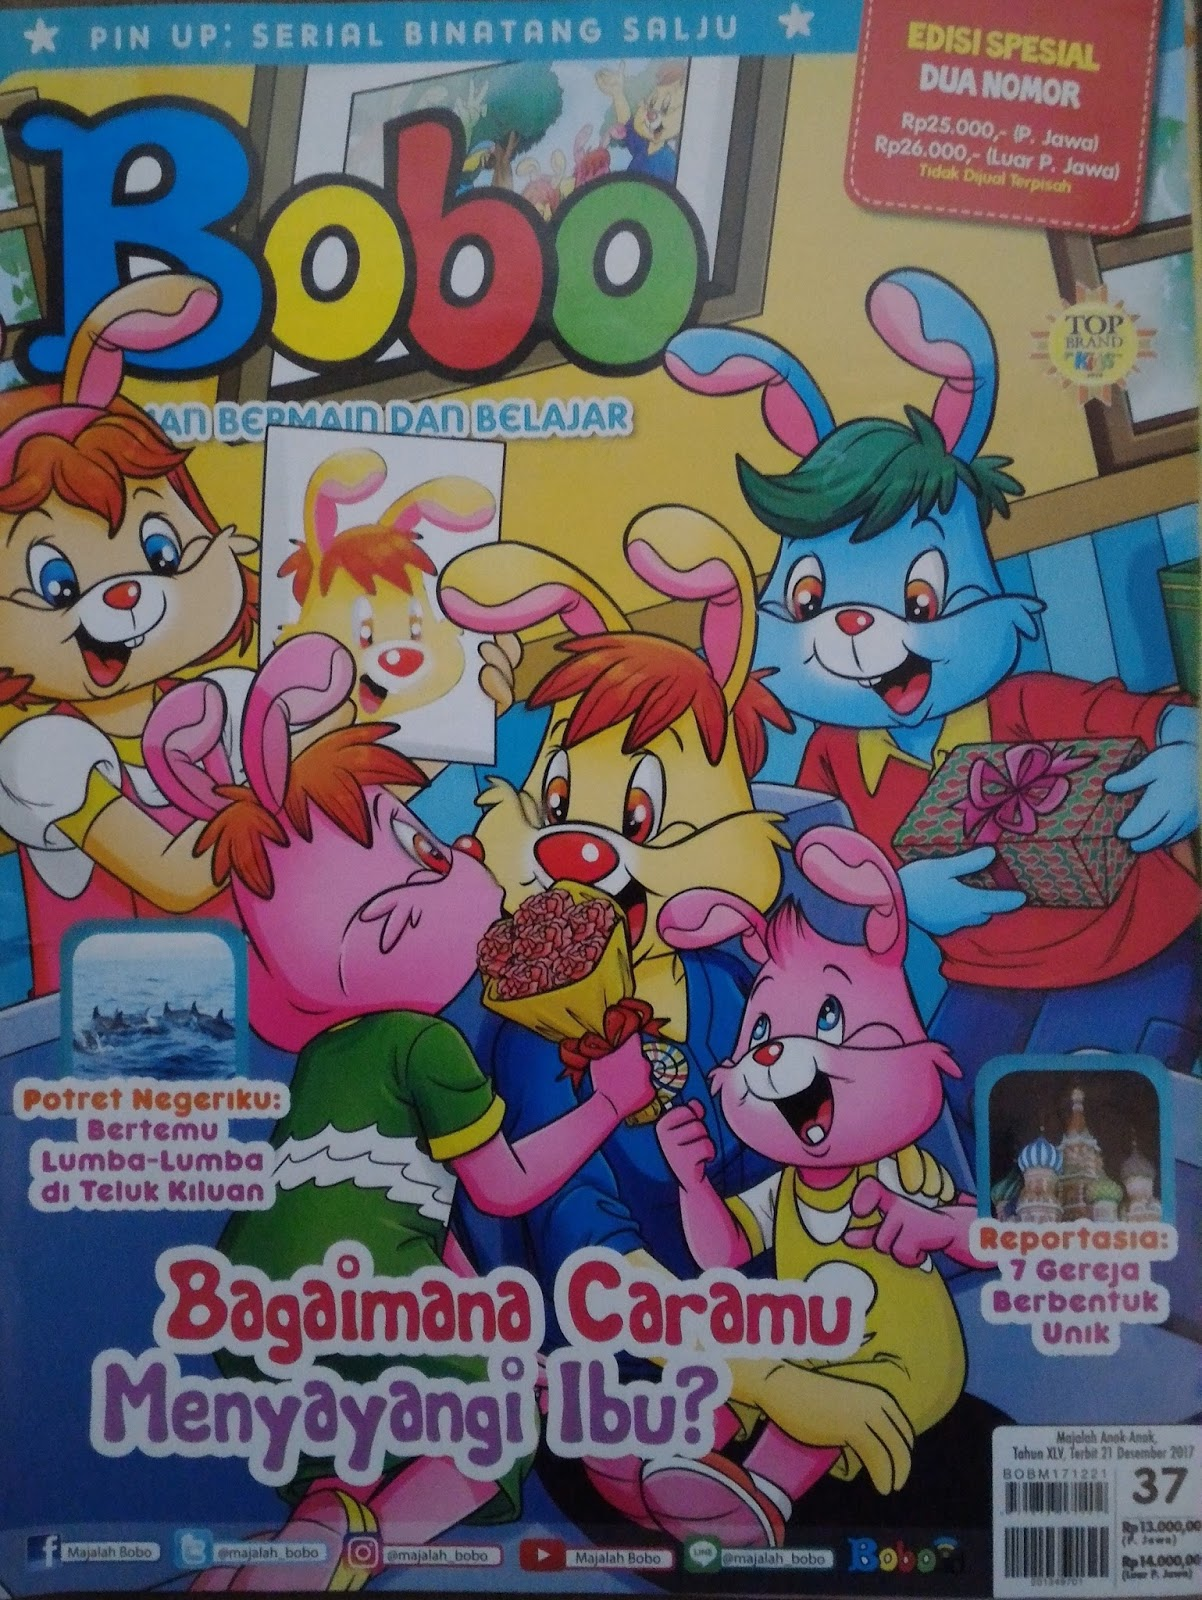 Majalah Bobo Edisi 37 tahun 2017